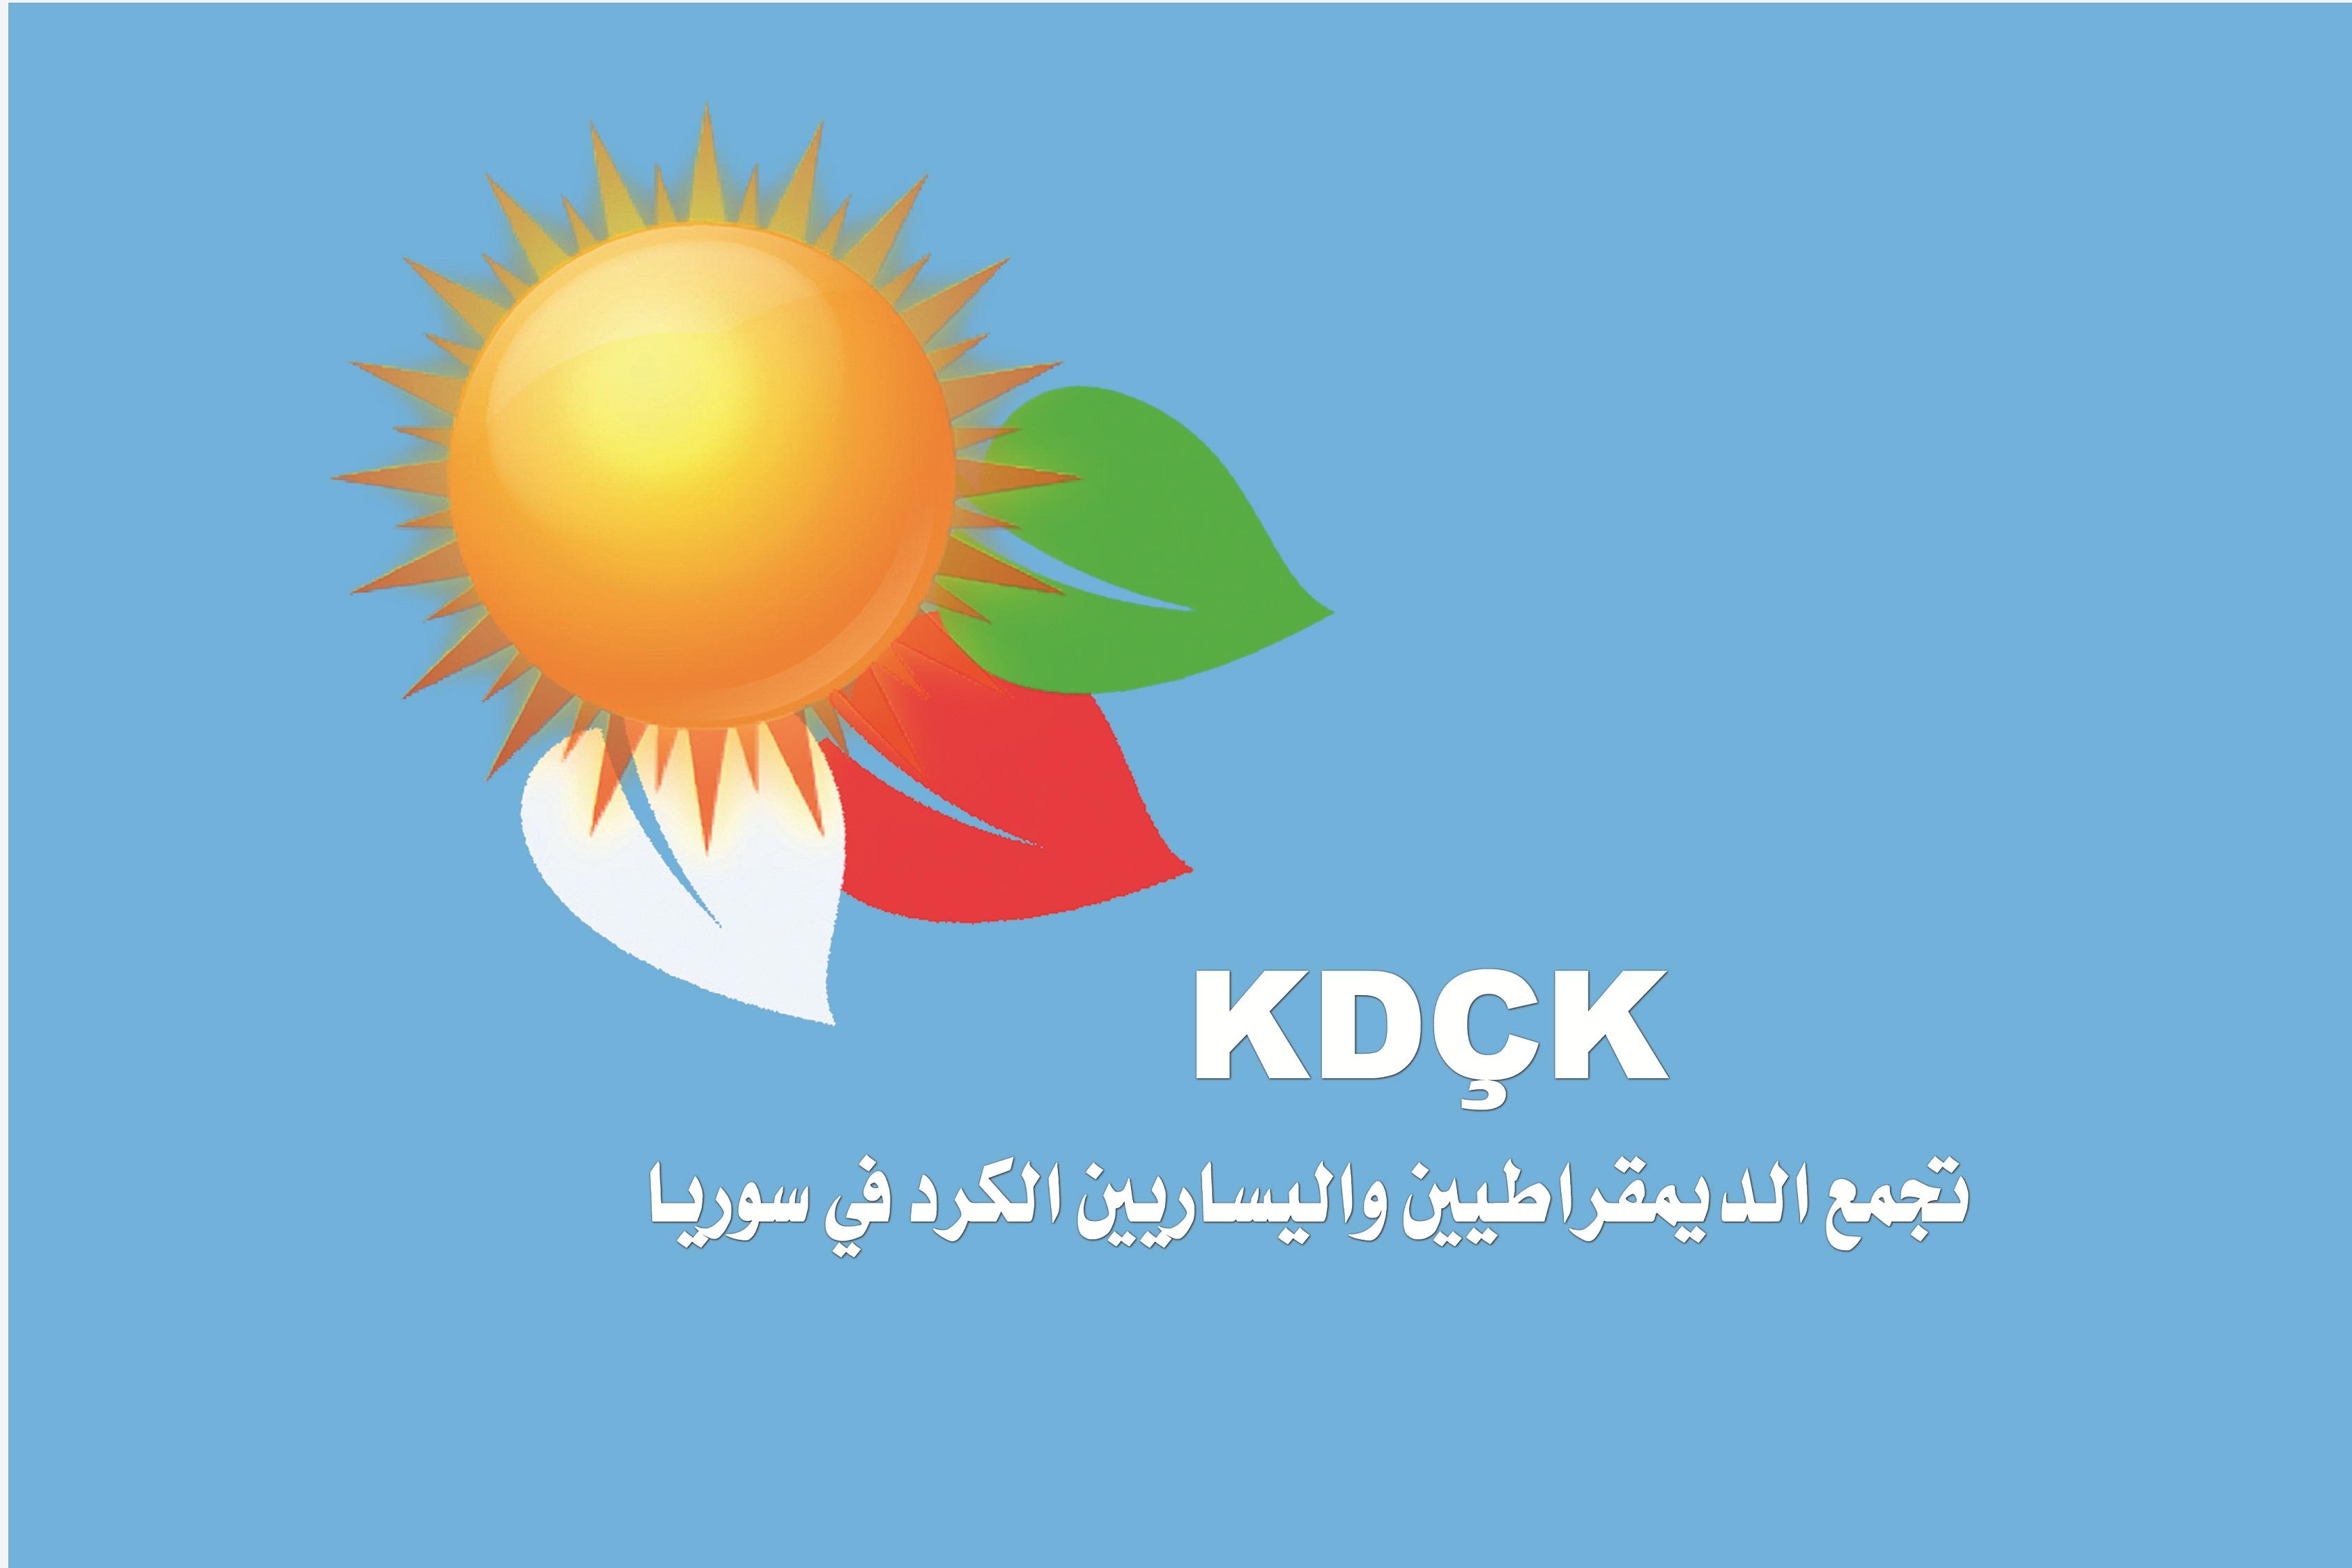 Photo of تجمع الديمقراطيين واليساريين: على مزارعين المنطقة أخذ الحذر من أساليب النظام